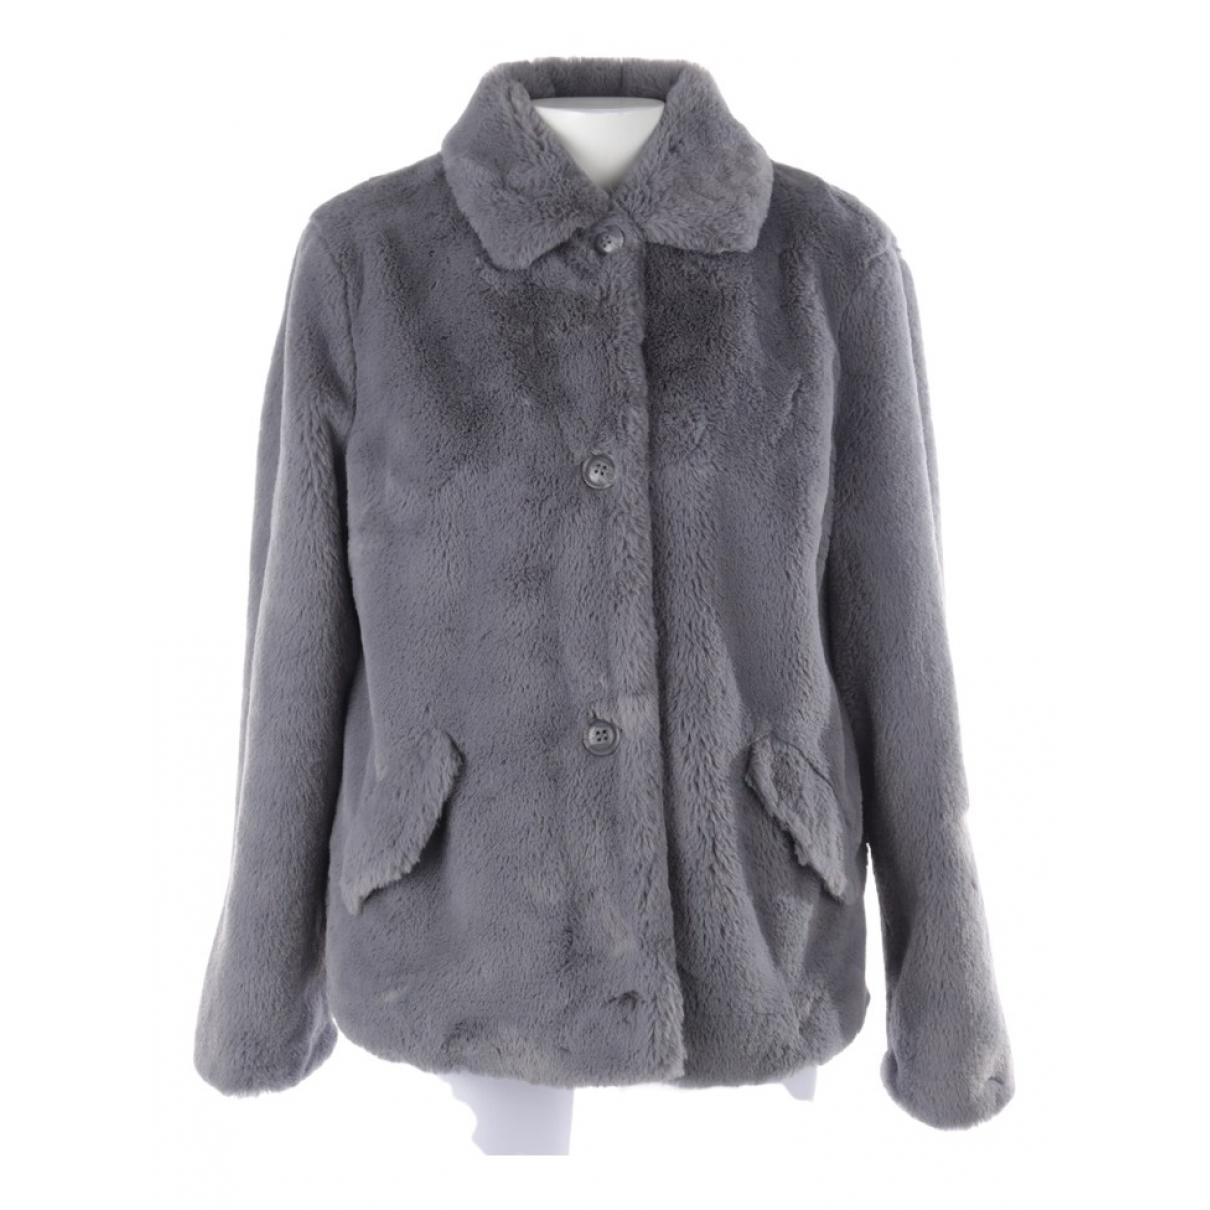 Autre Marque \N Grey jacket for Women XL International